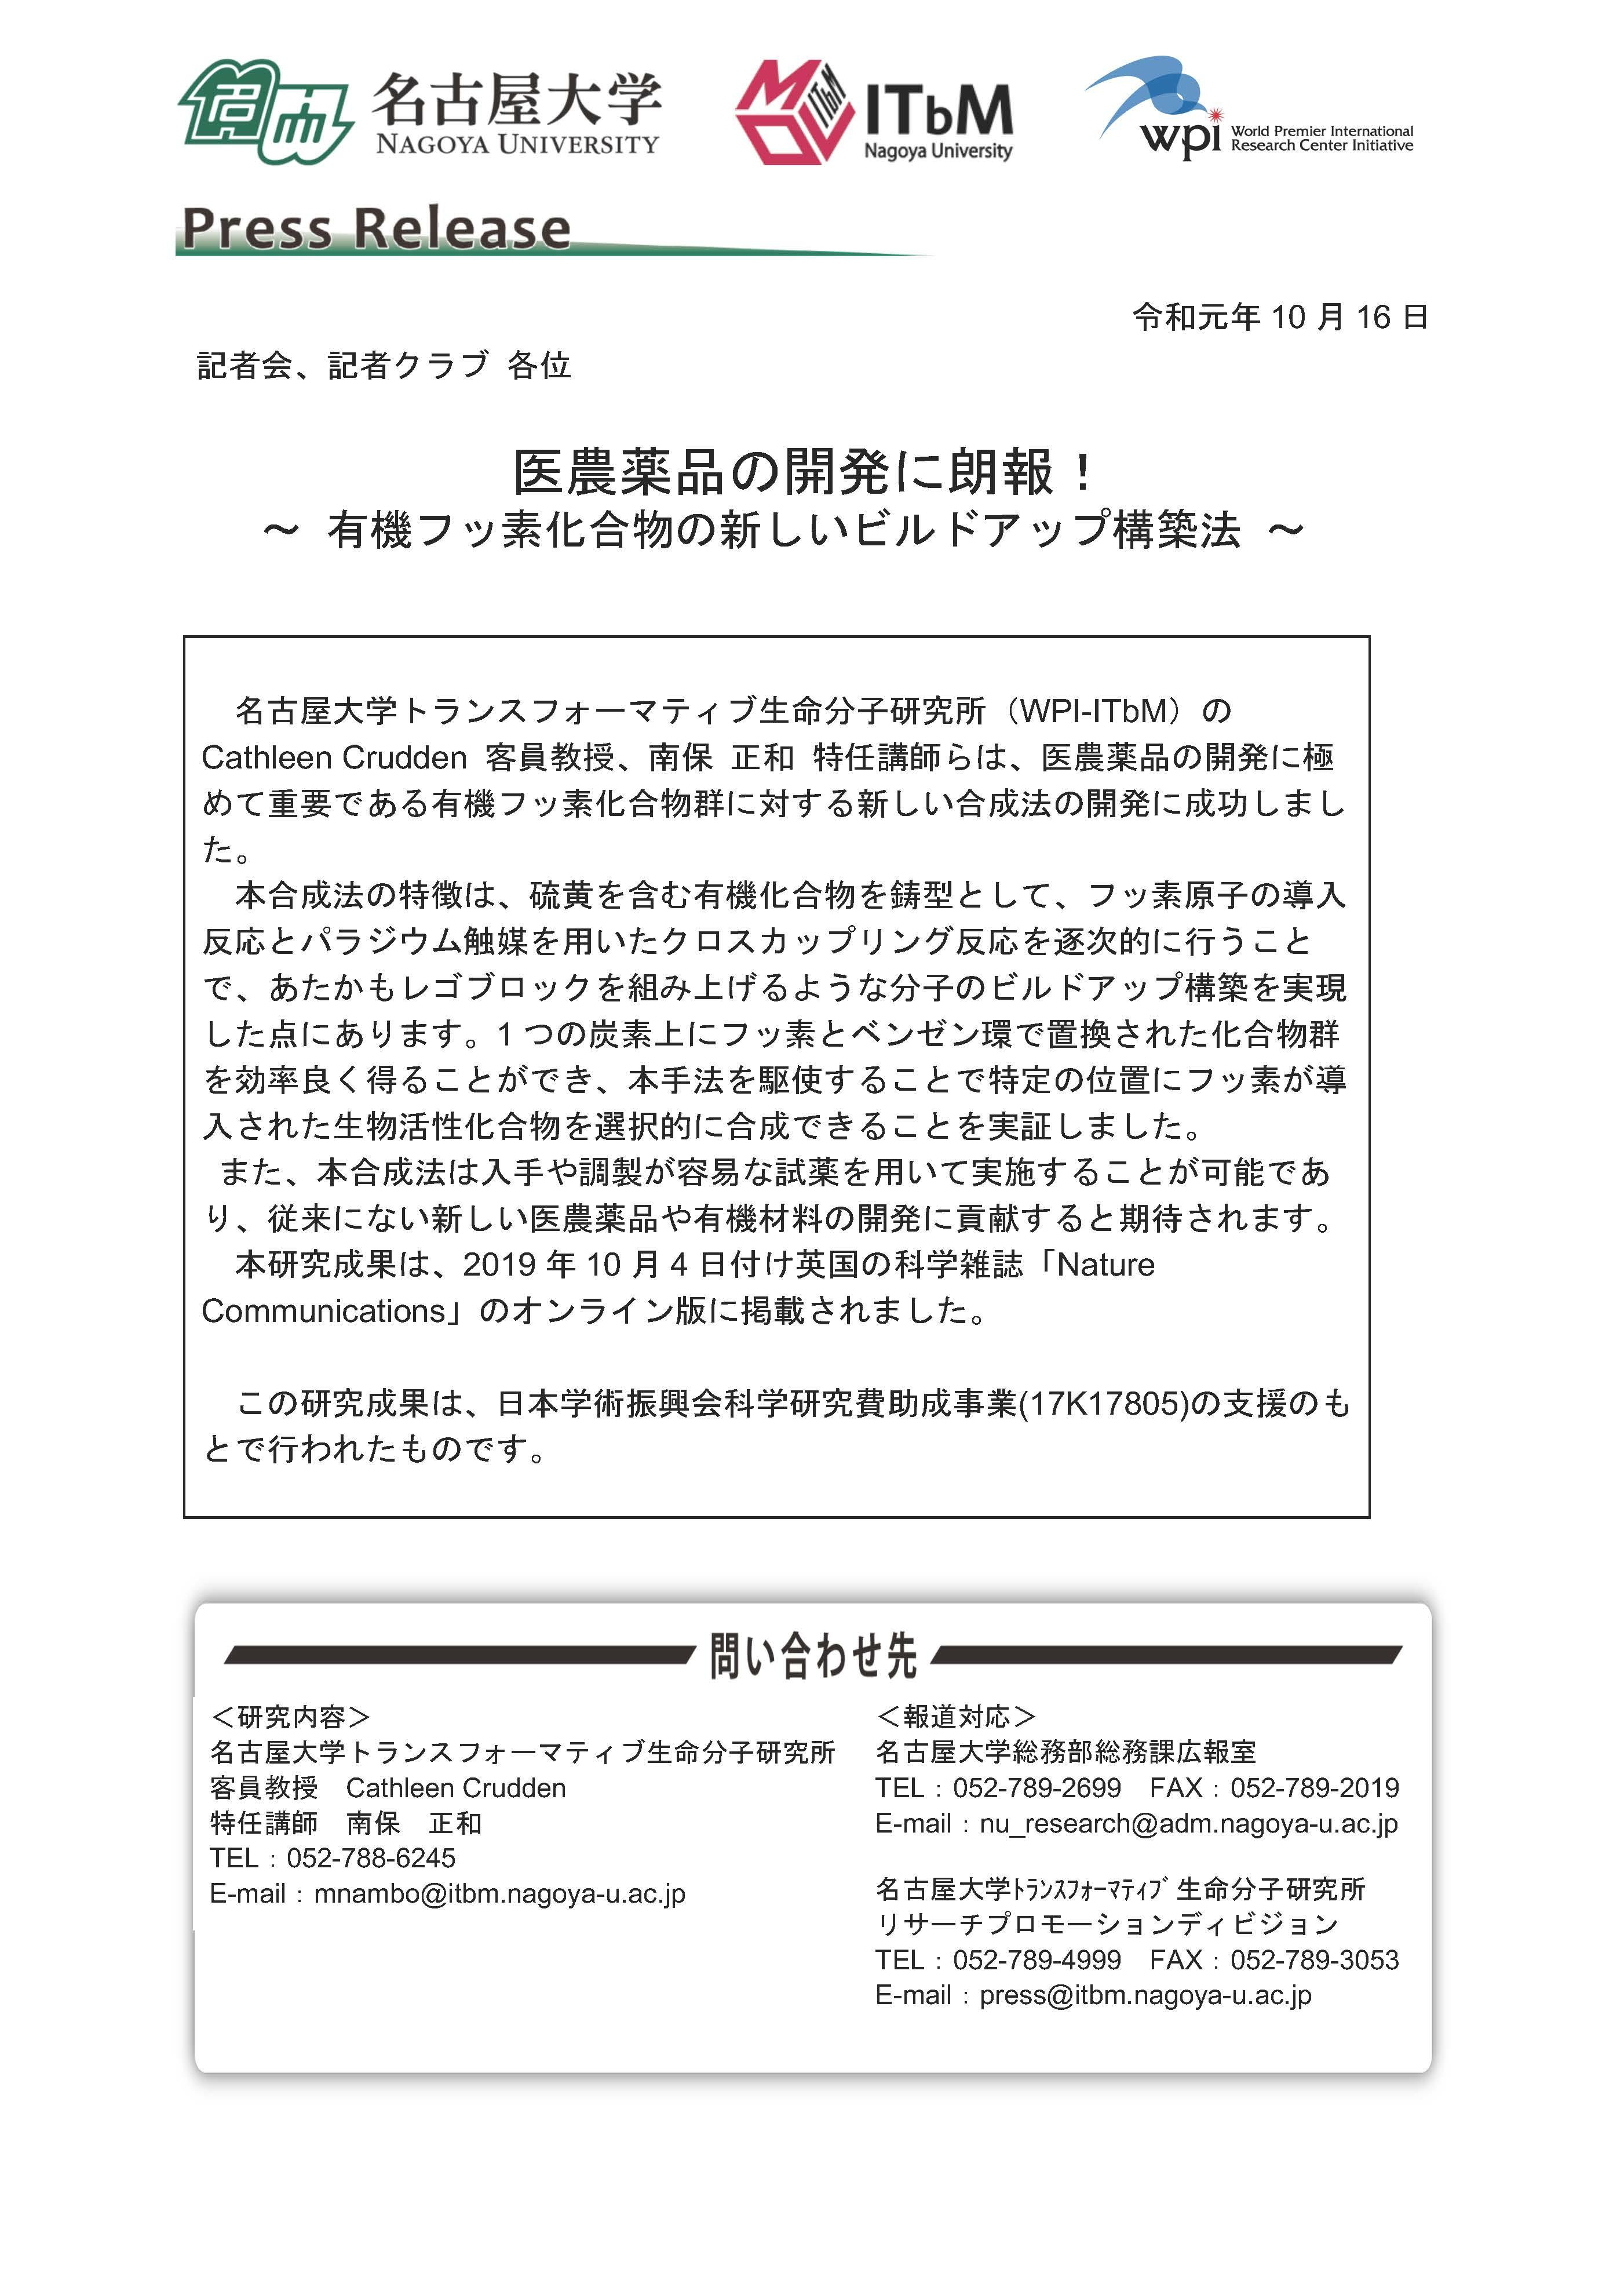 http://www.itbm.nagoya-u.ac.jp/ja/research/20191016_nanbo.jpg